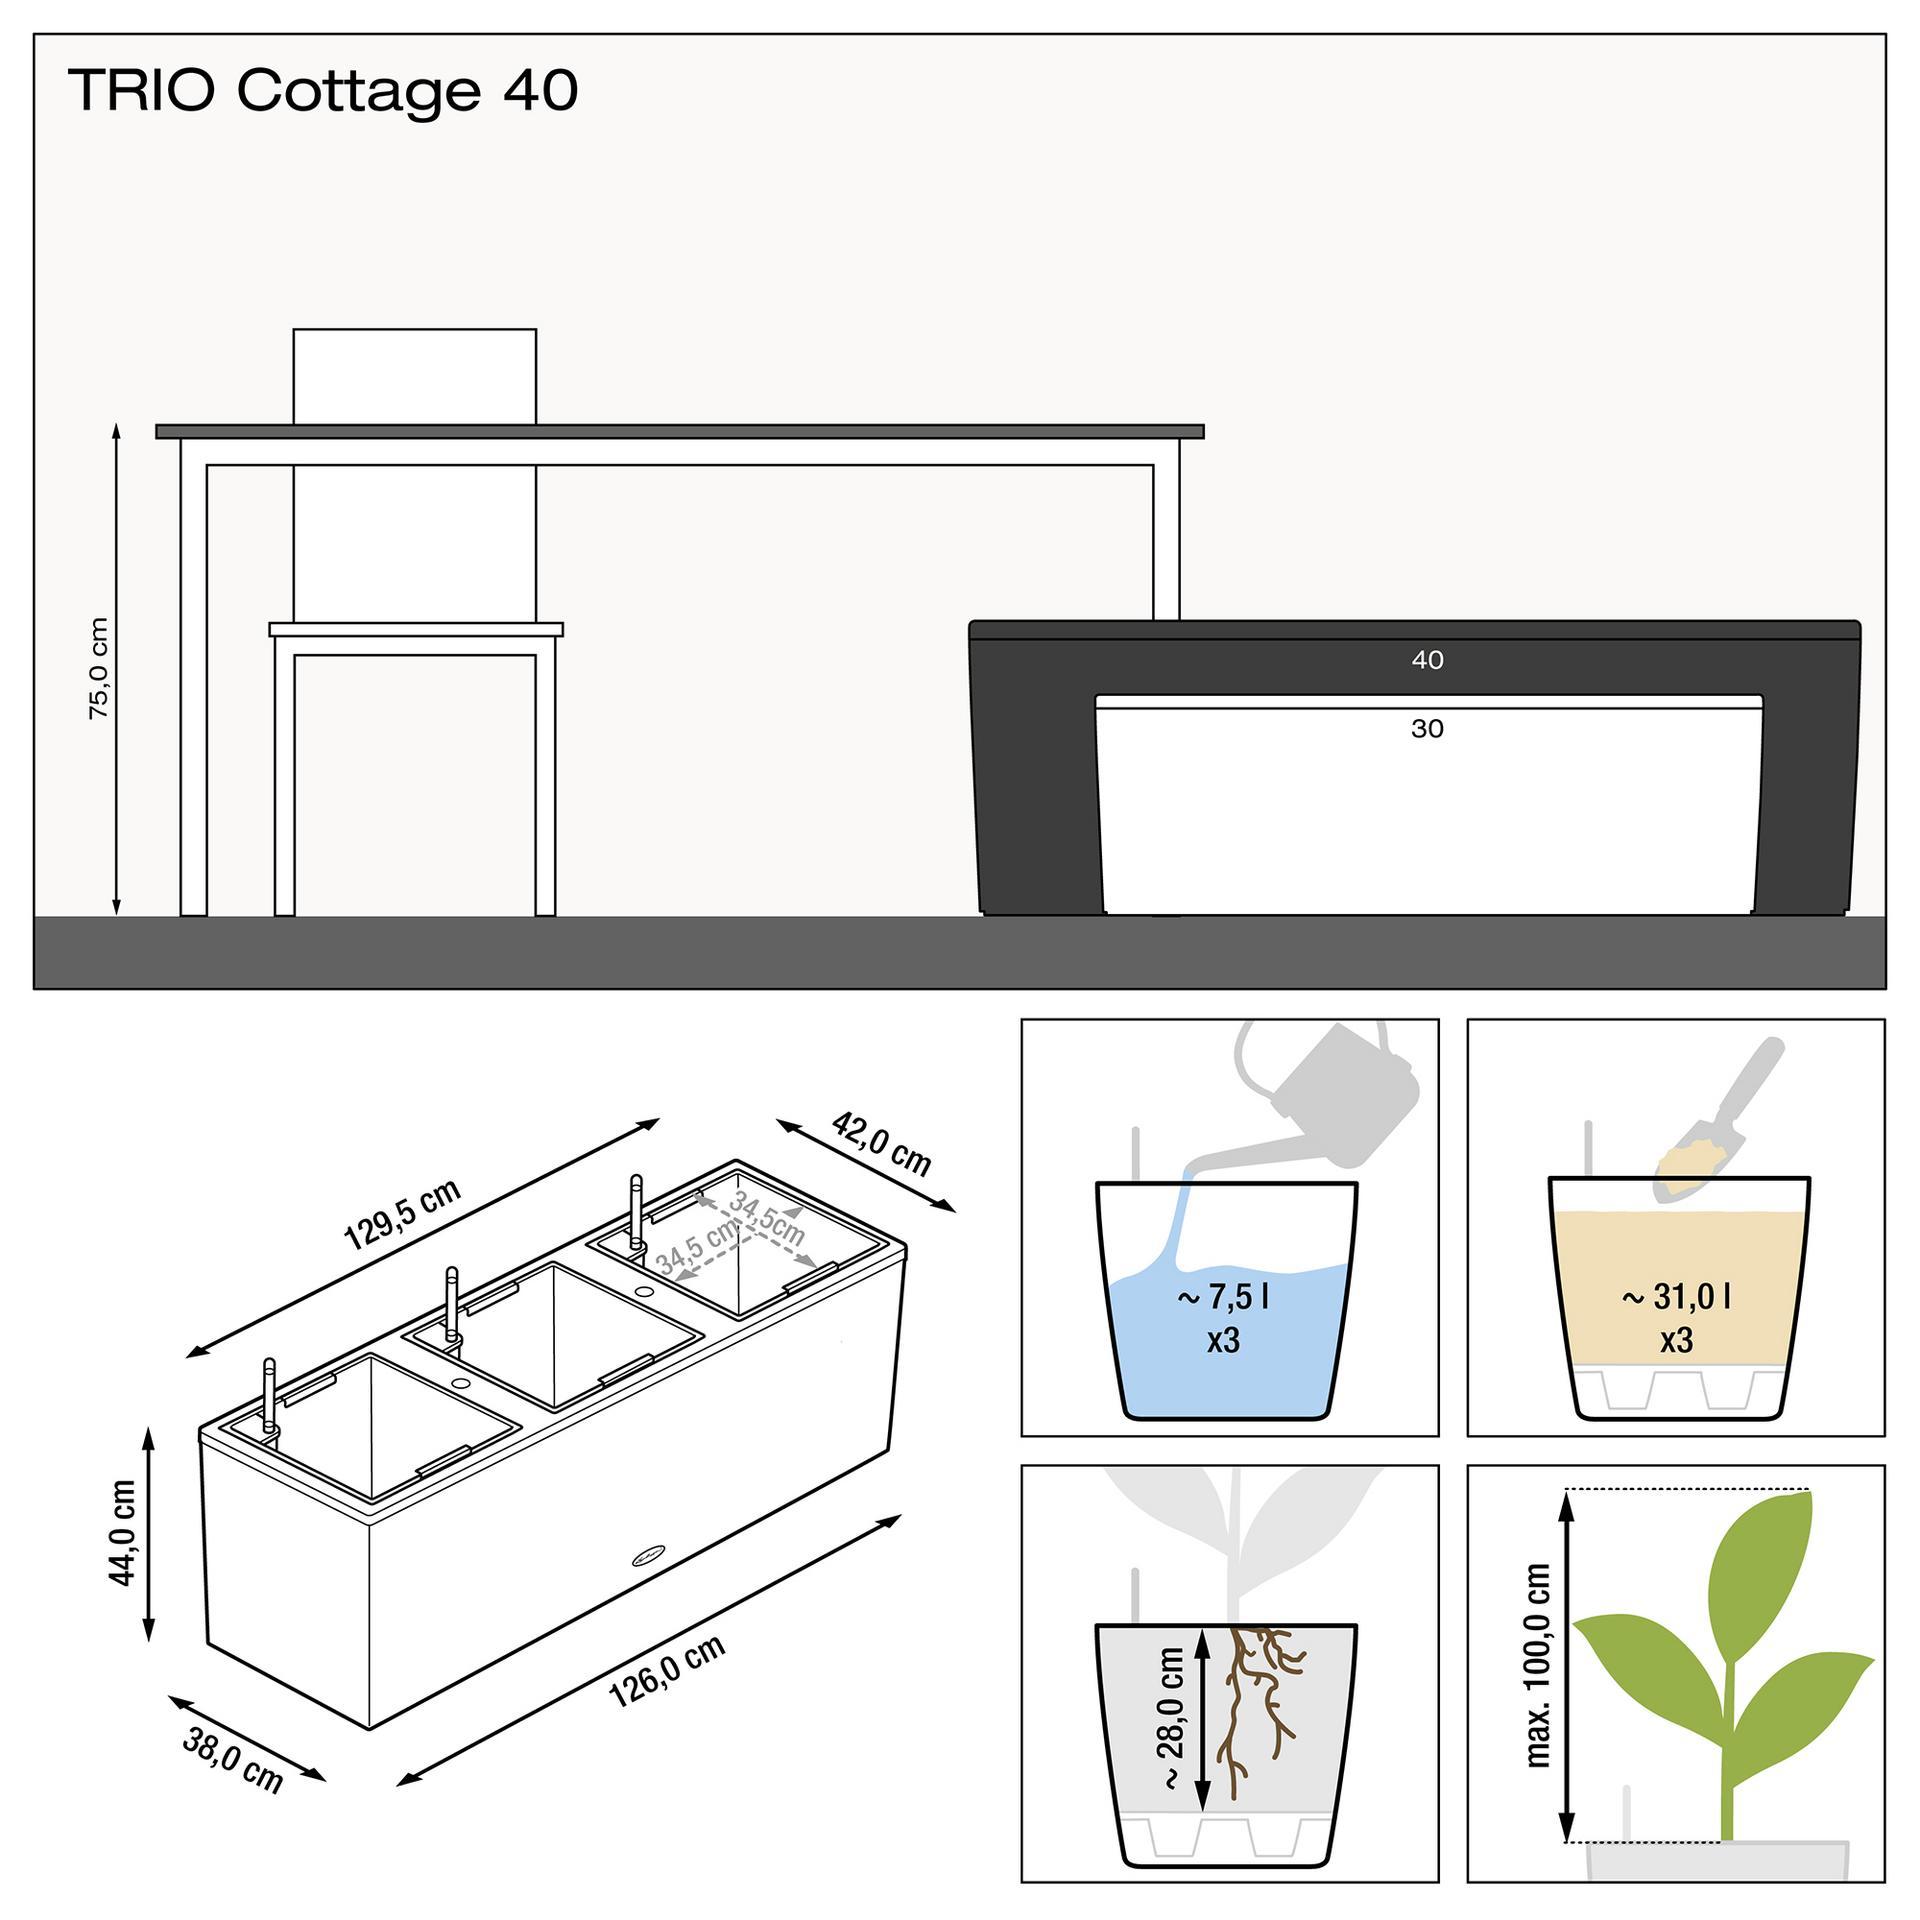 le_trio-cottage40_product_addi_nz